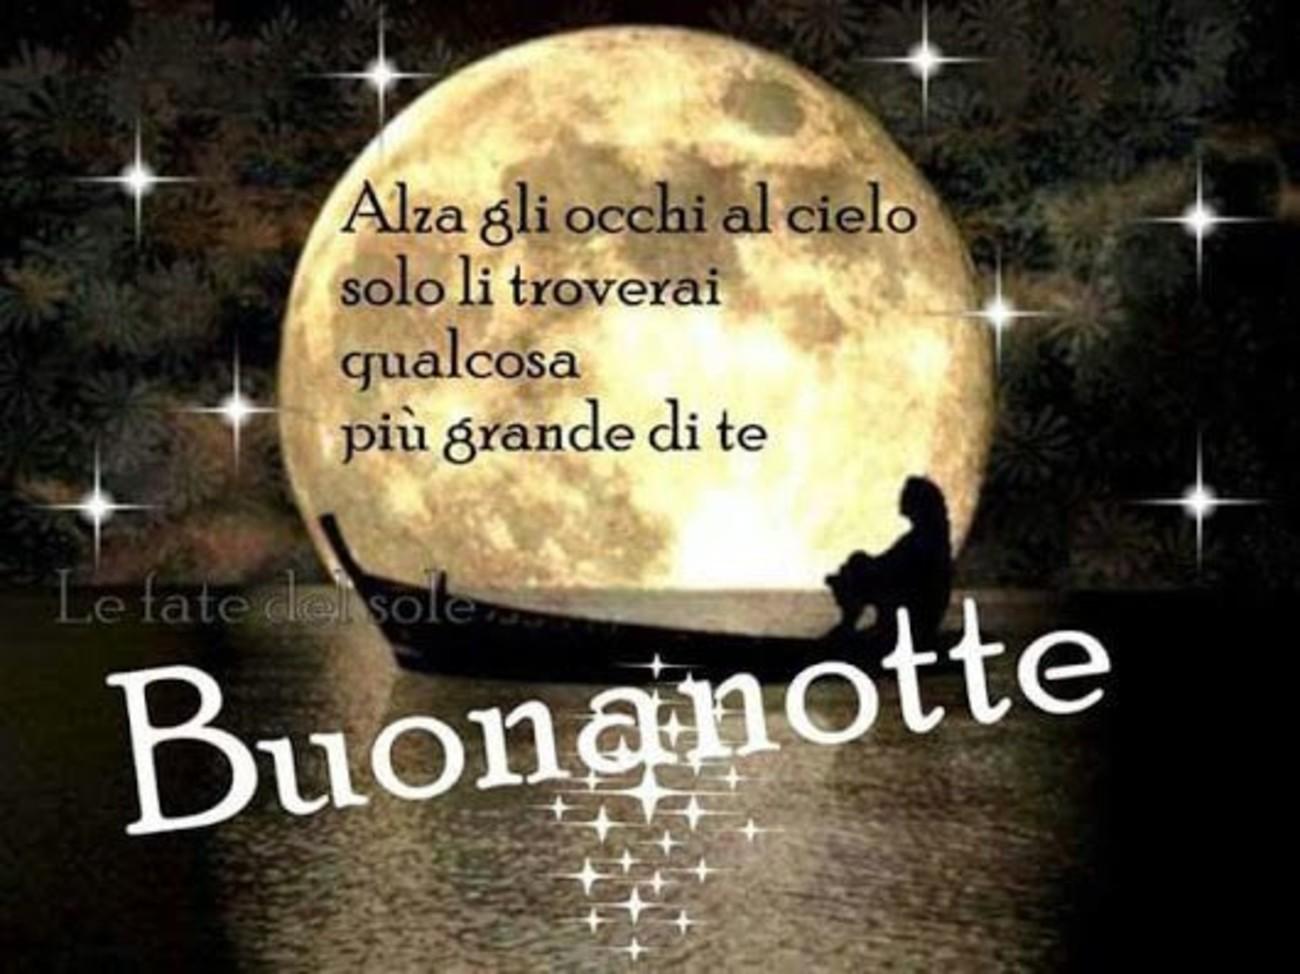 Immagini gratis buonanotte (1)